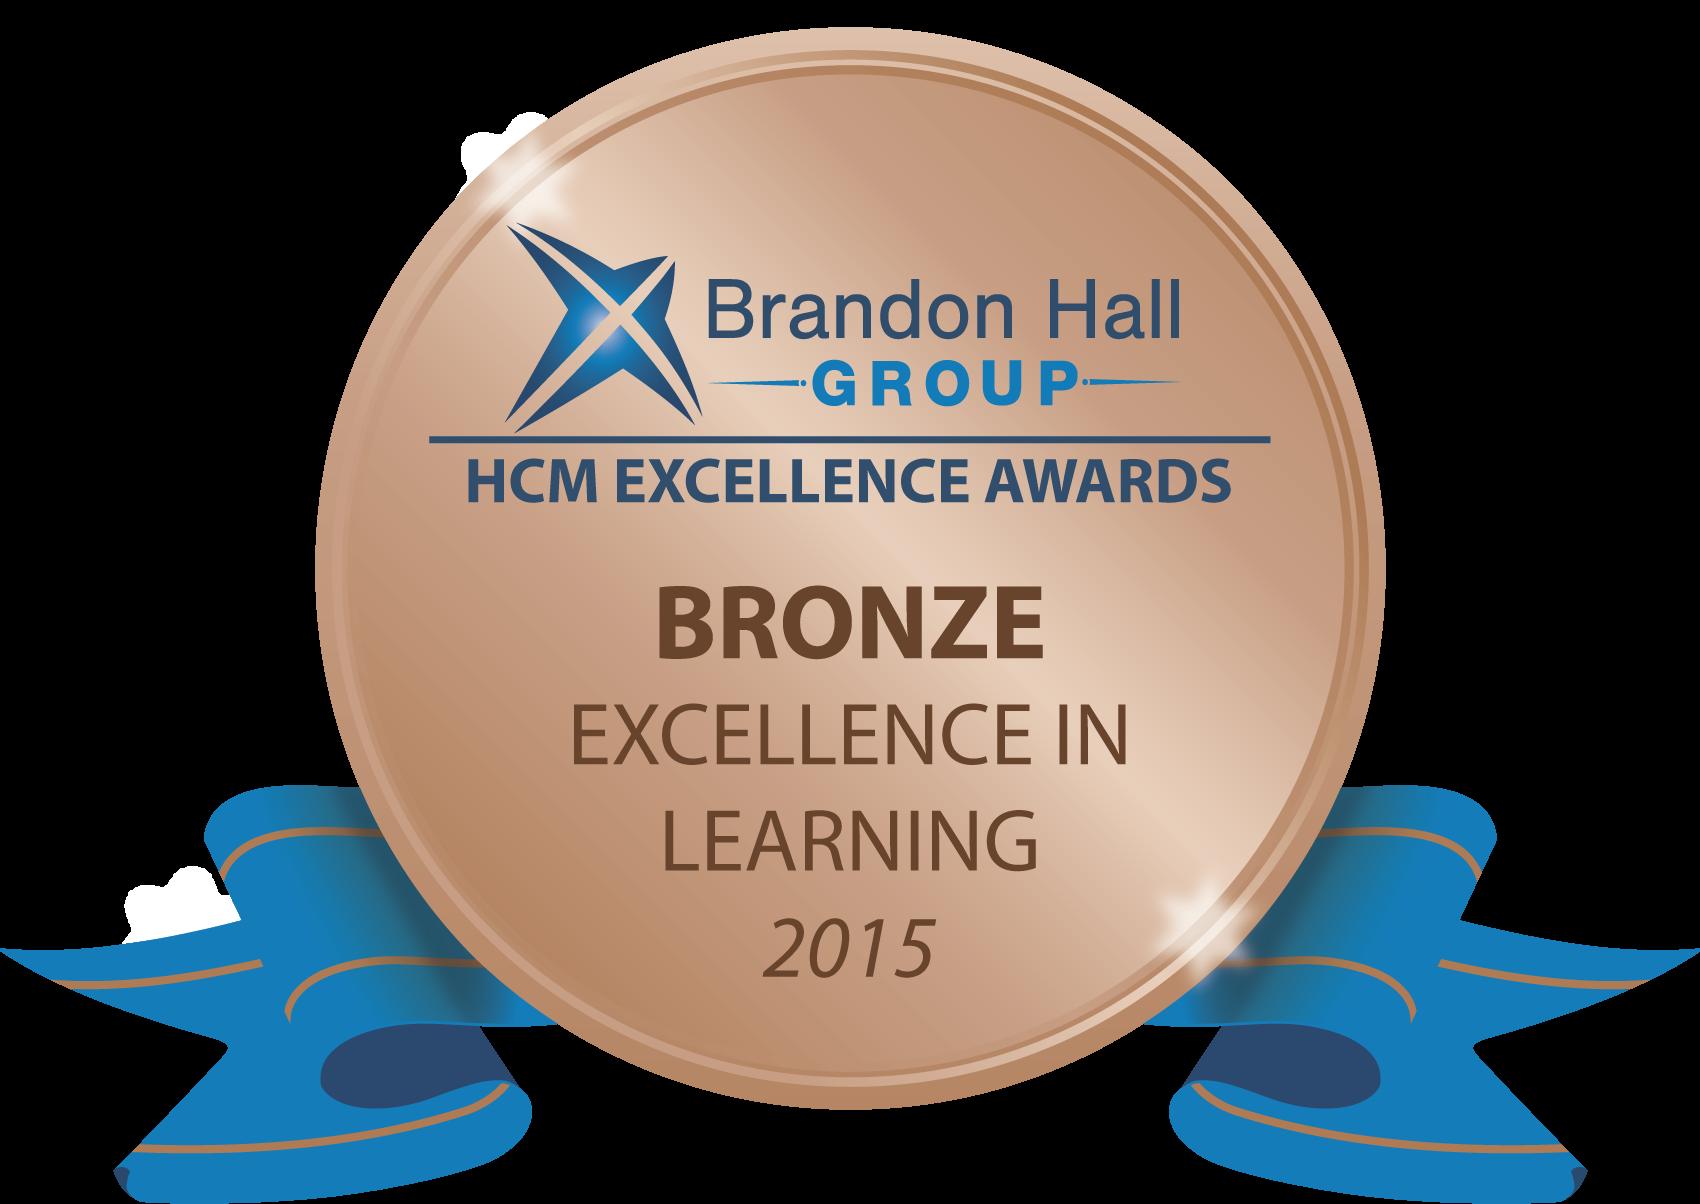 brandon-hall-bronze-knowledge-guru